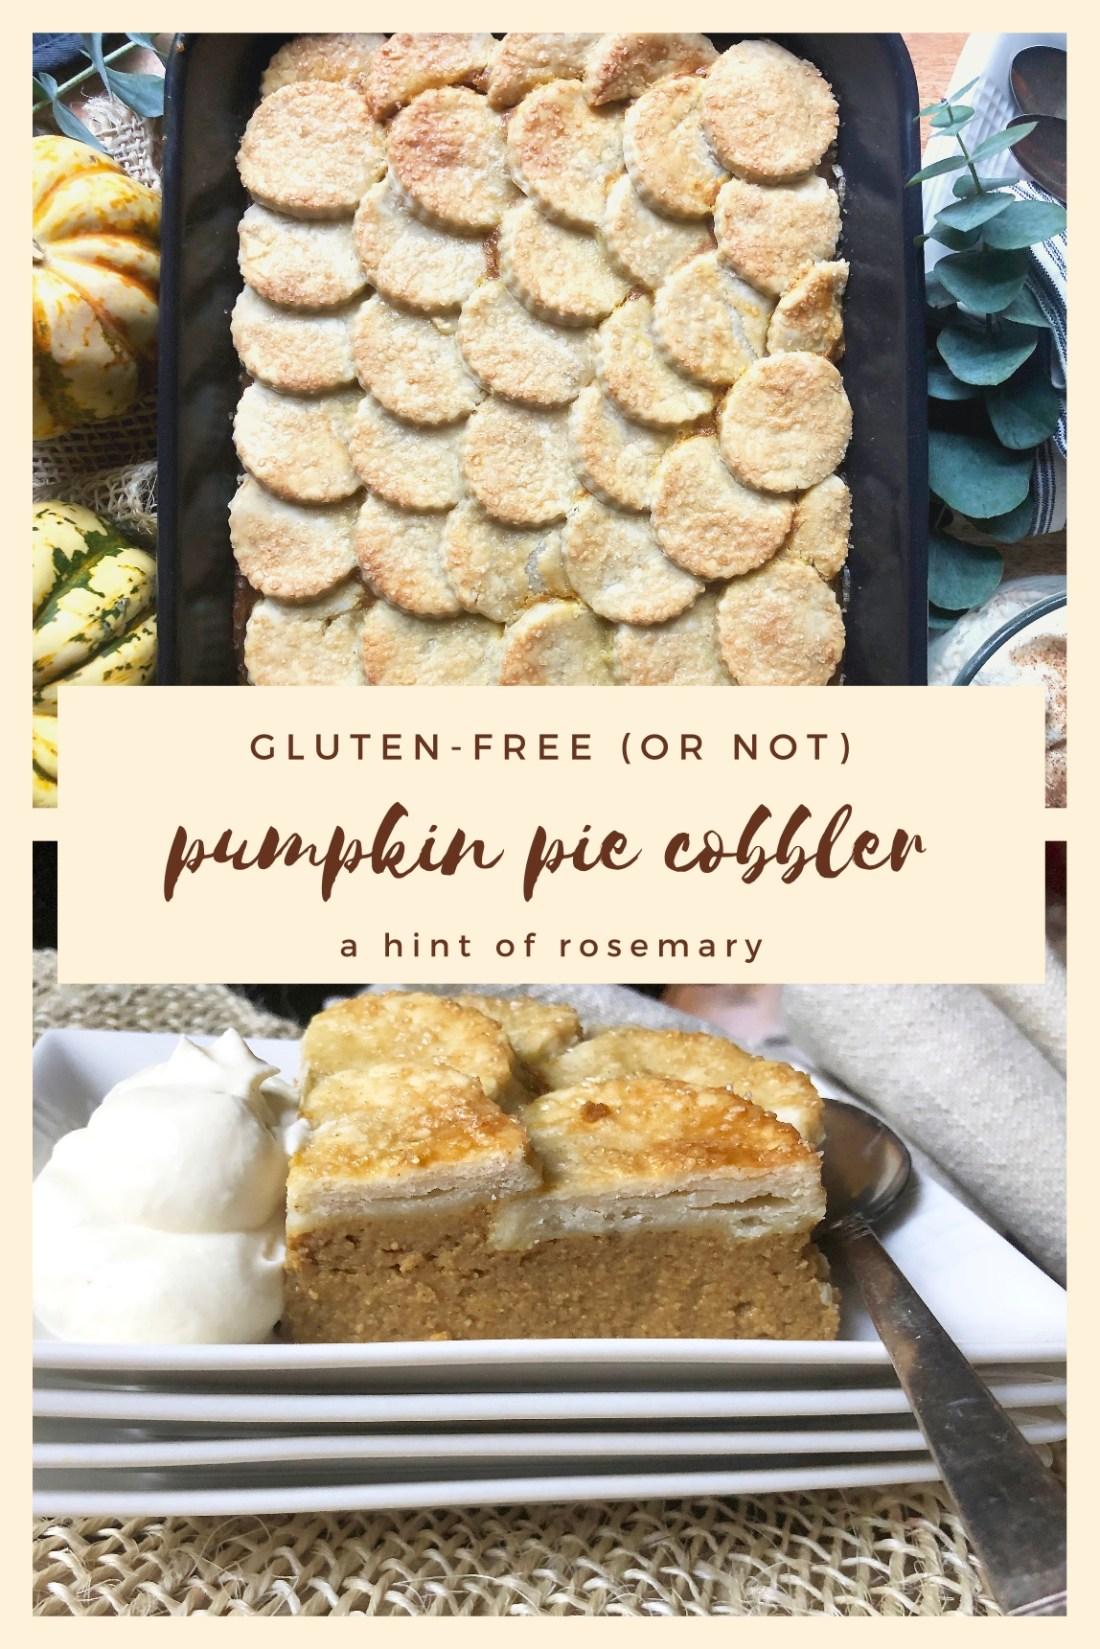 gluten-free pumpkin pie cobbler